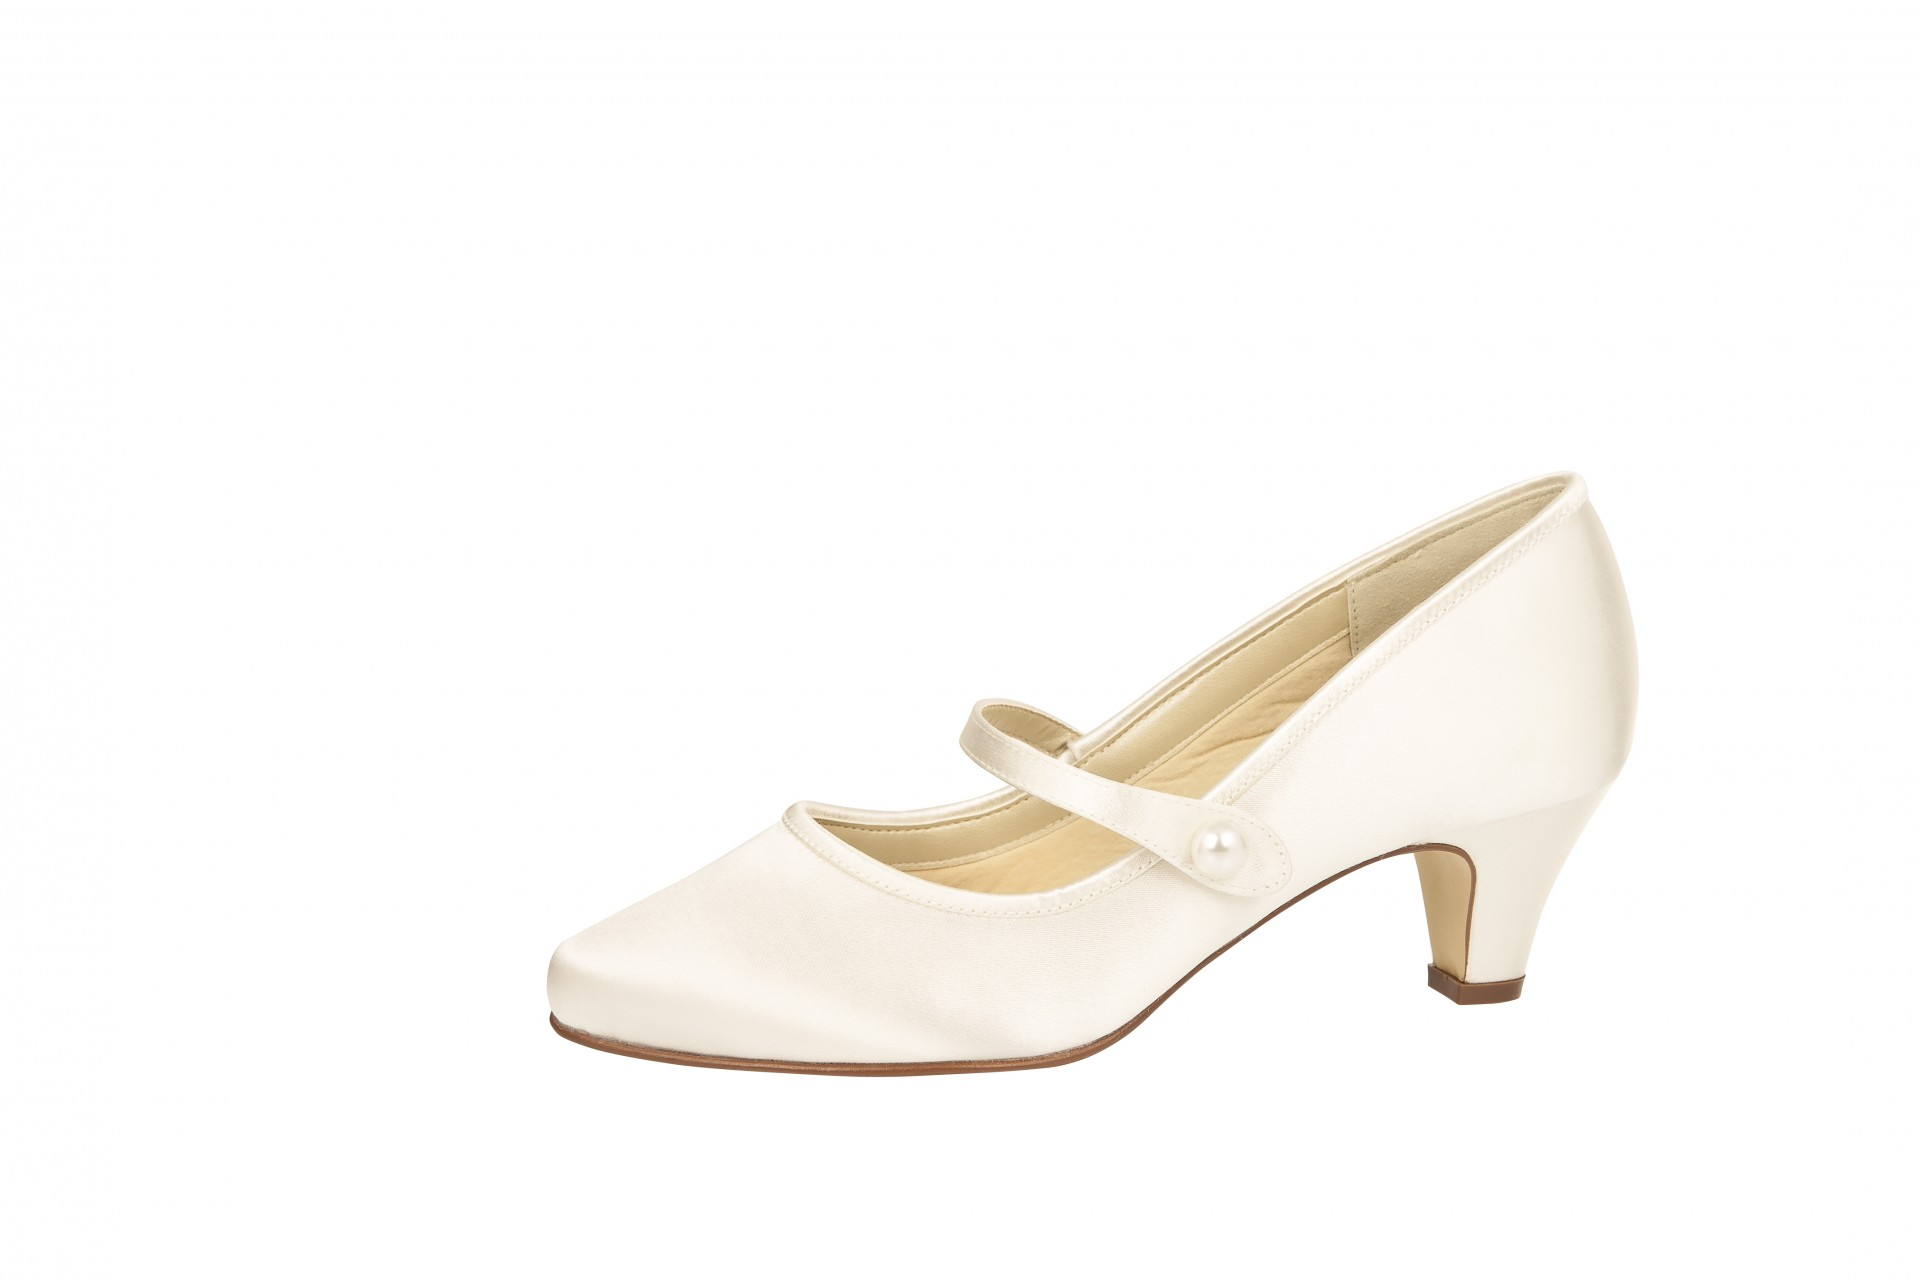 Elsa Coloured Shoes: Heather